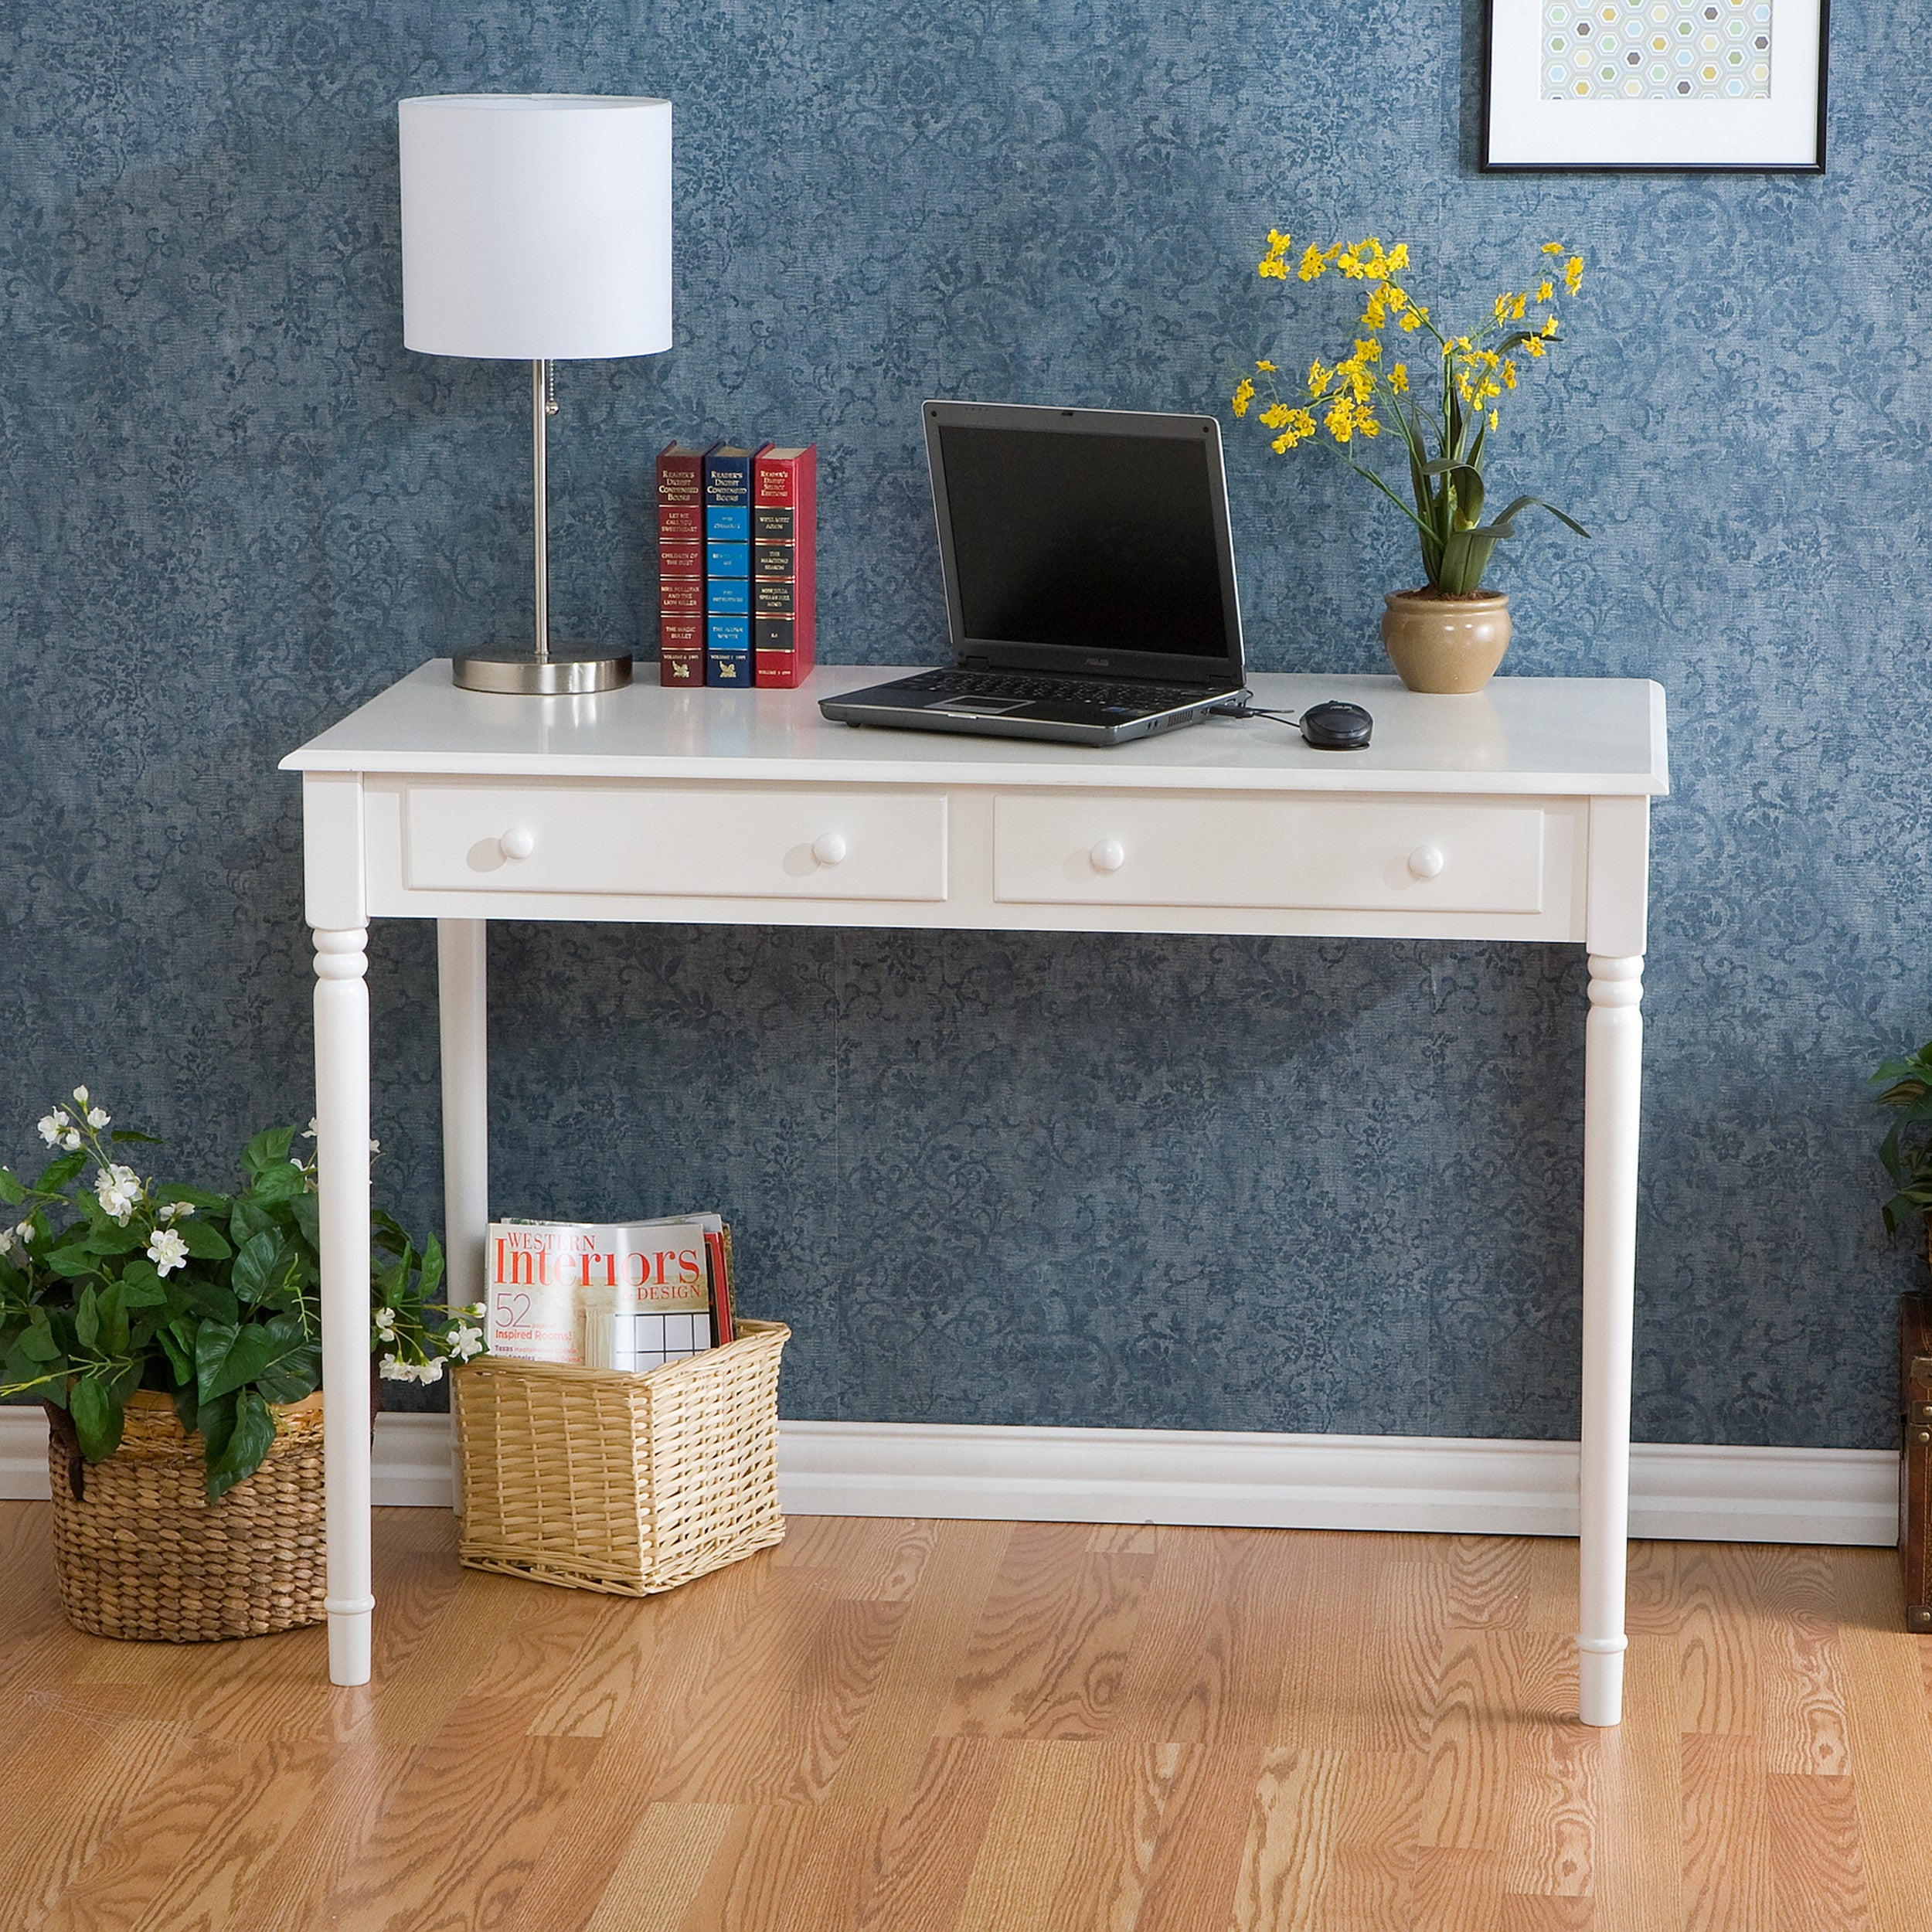 Gracewood Hollow Alicka 2-drawer White Writing Desk